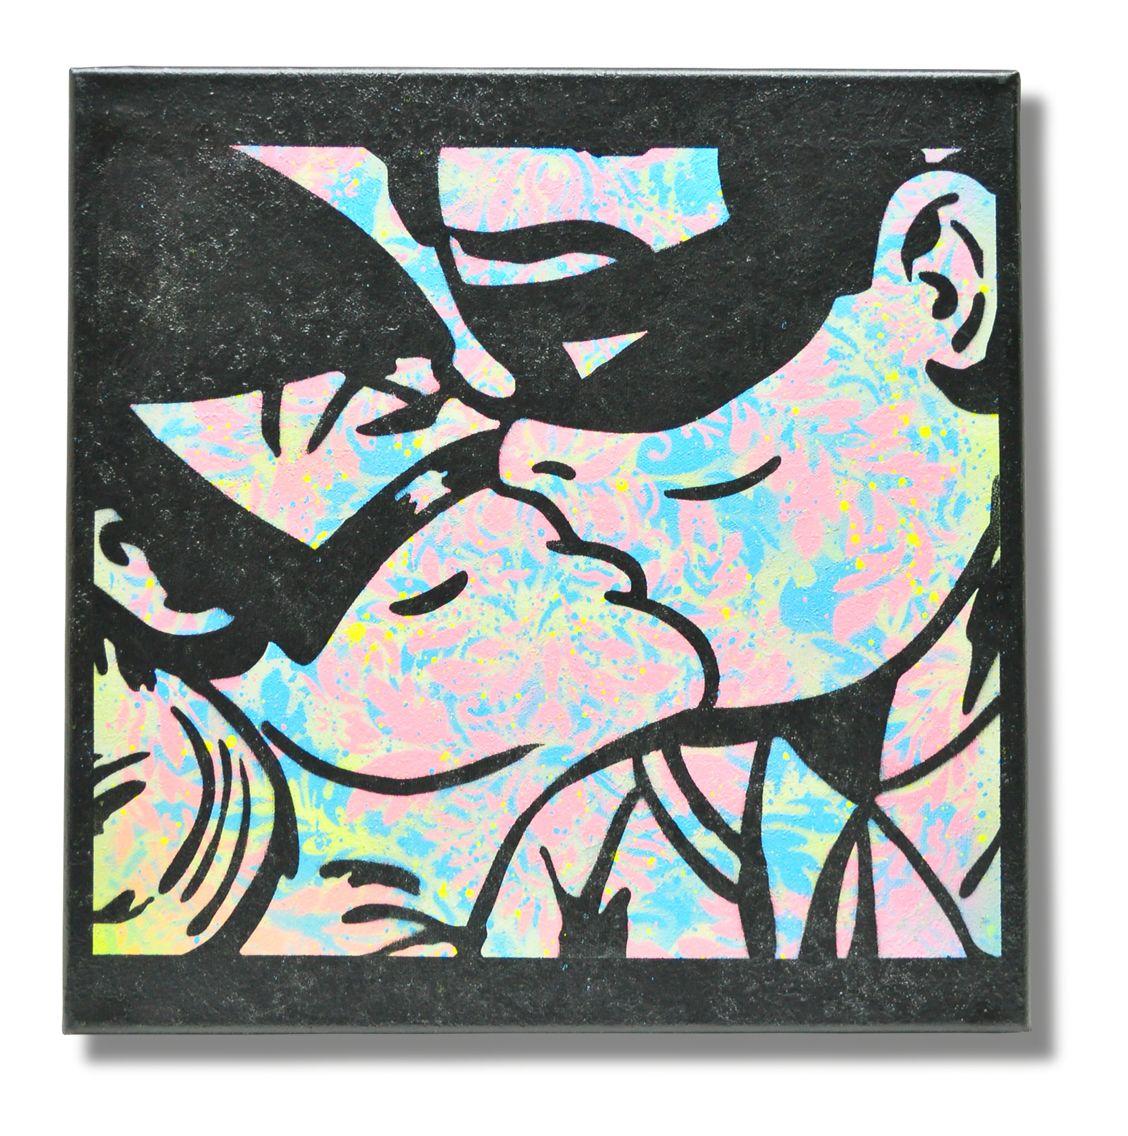 Robin kissing cat women stencil art on canvas by James Warner